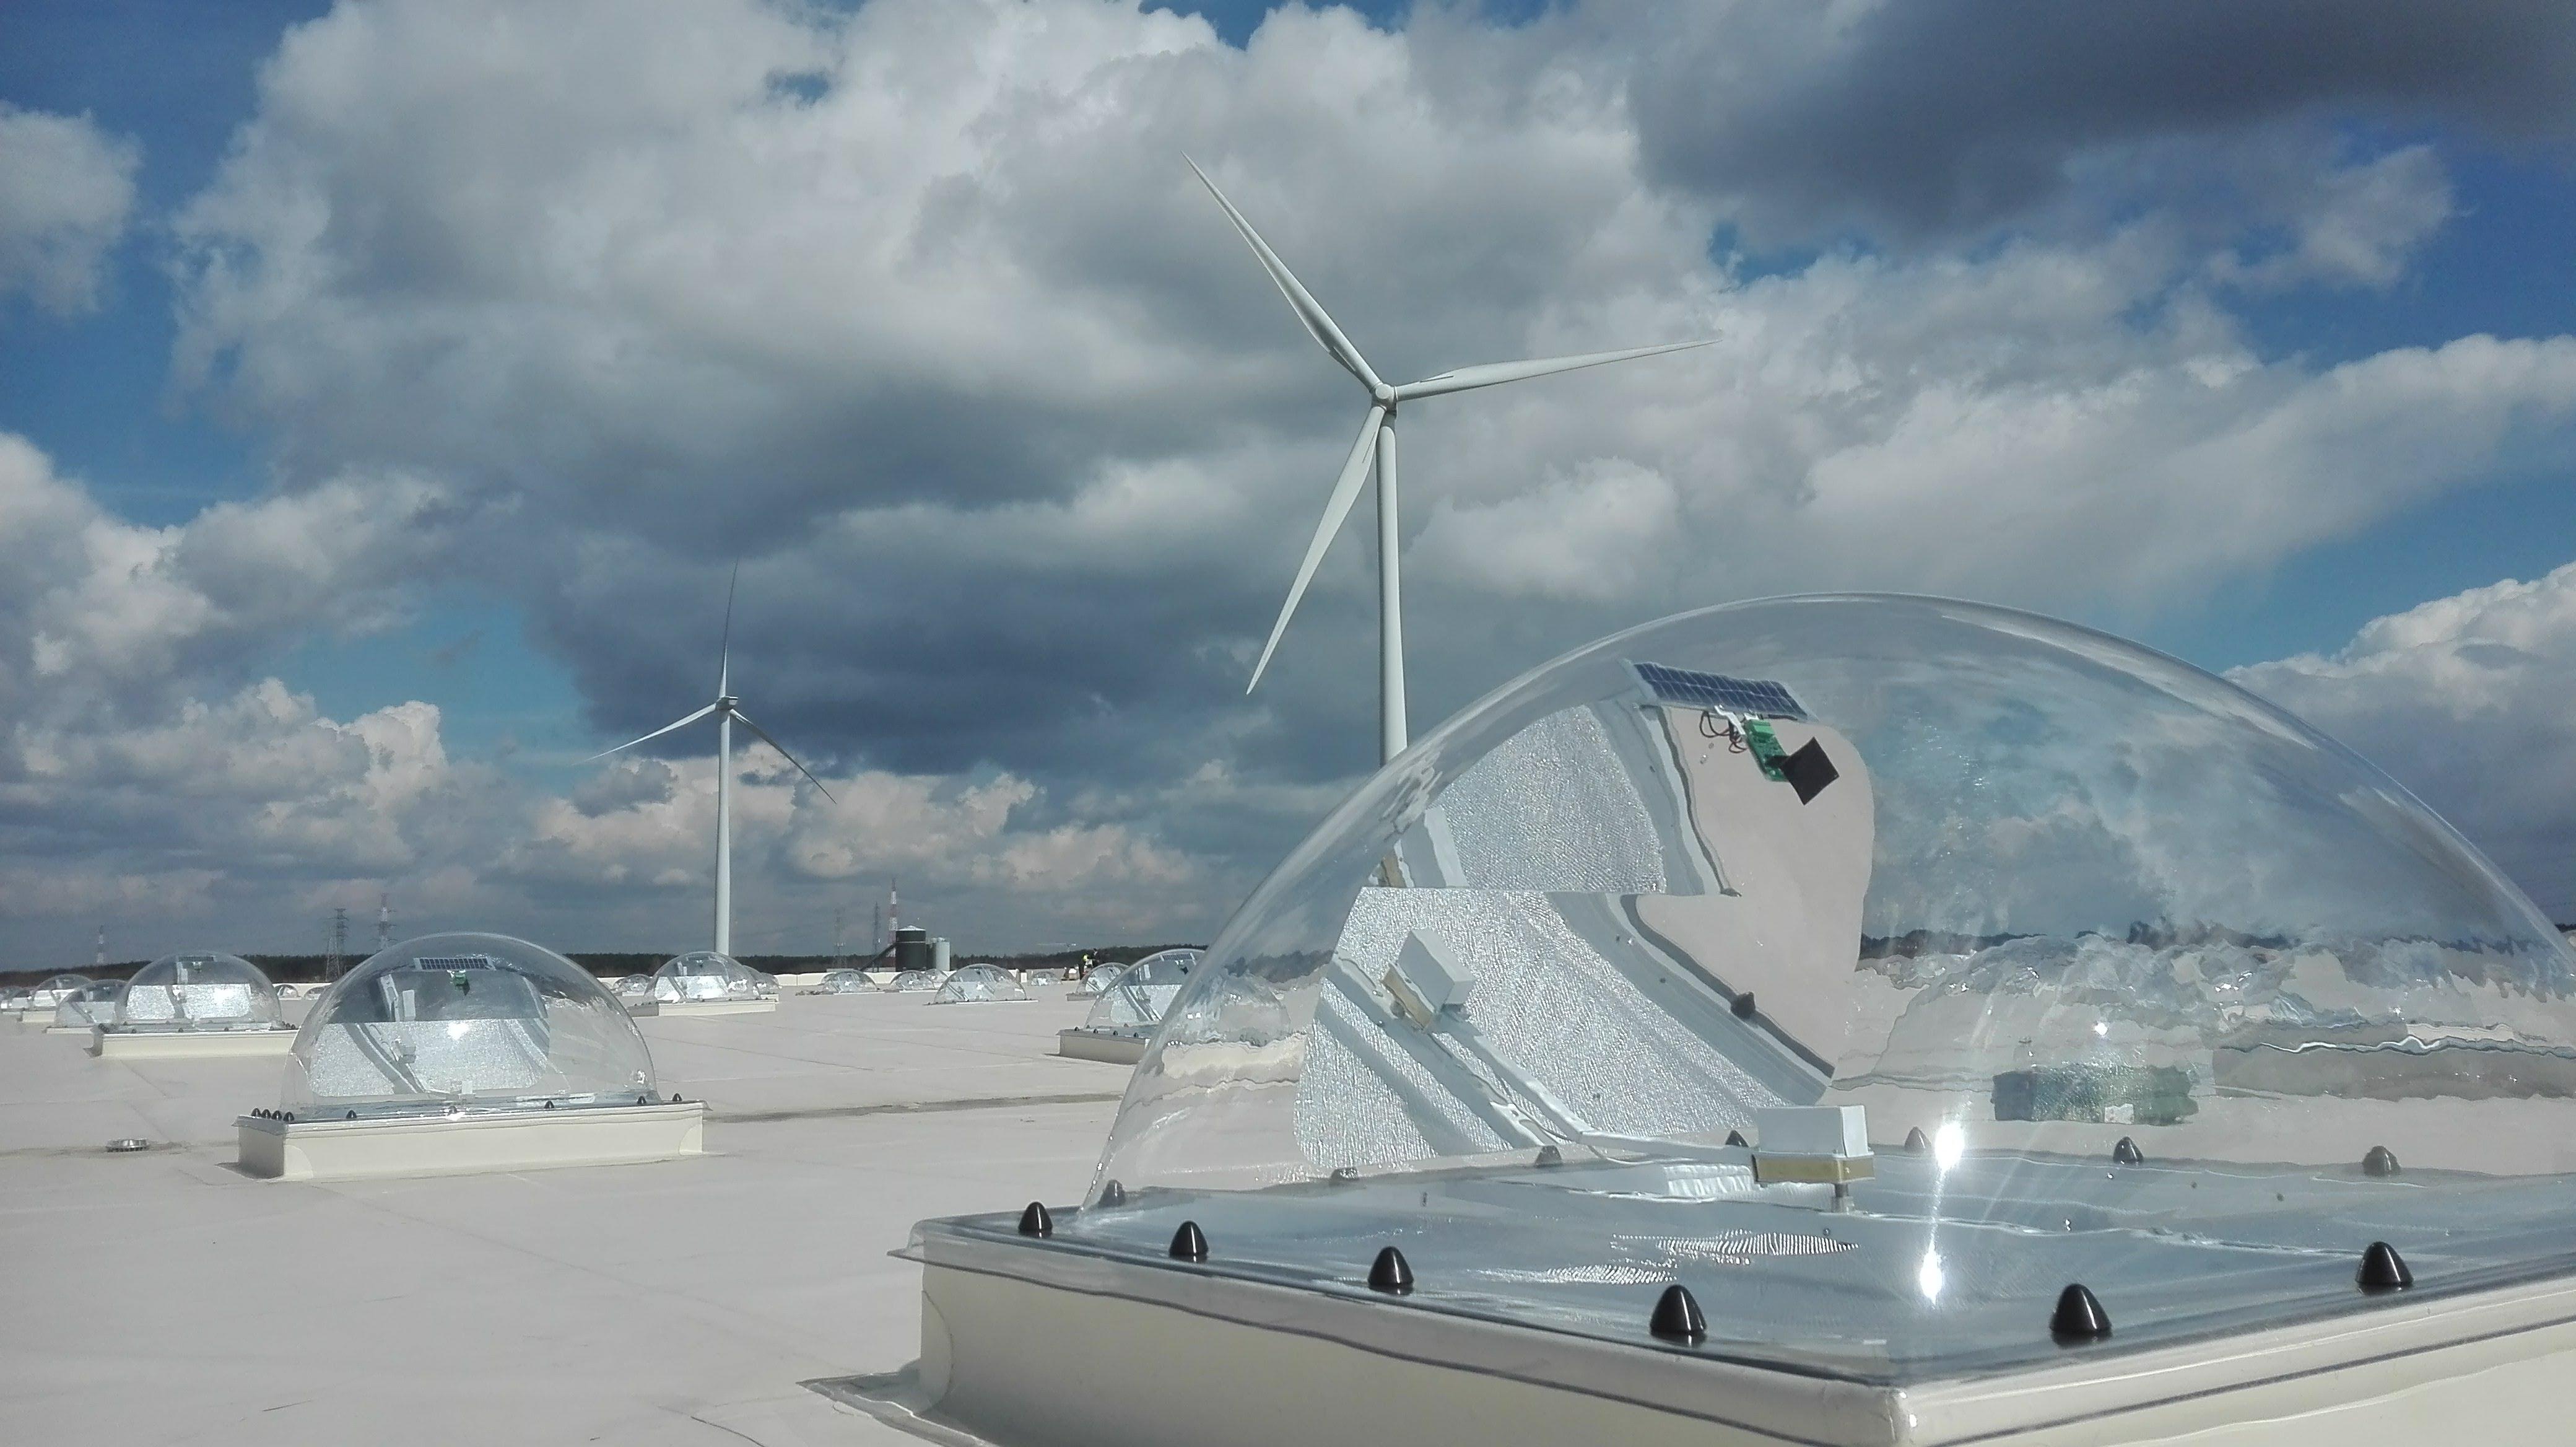 skylight-dome-edc-carglass-montea-05